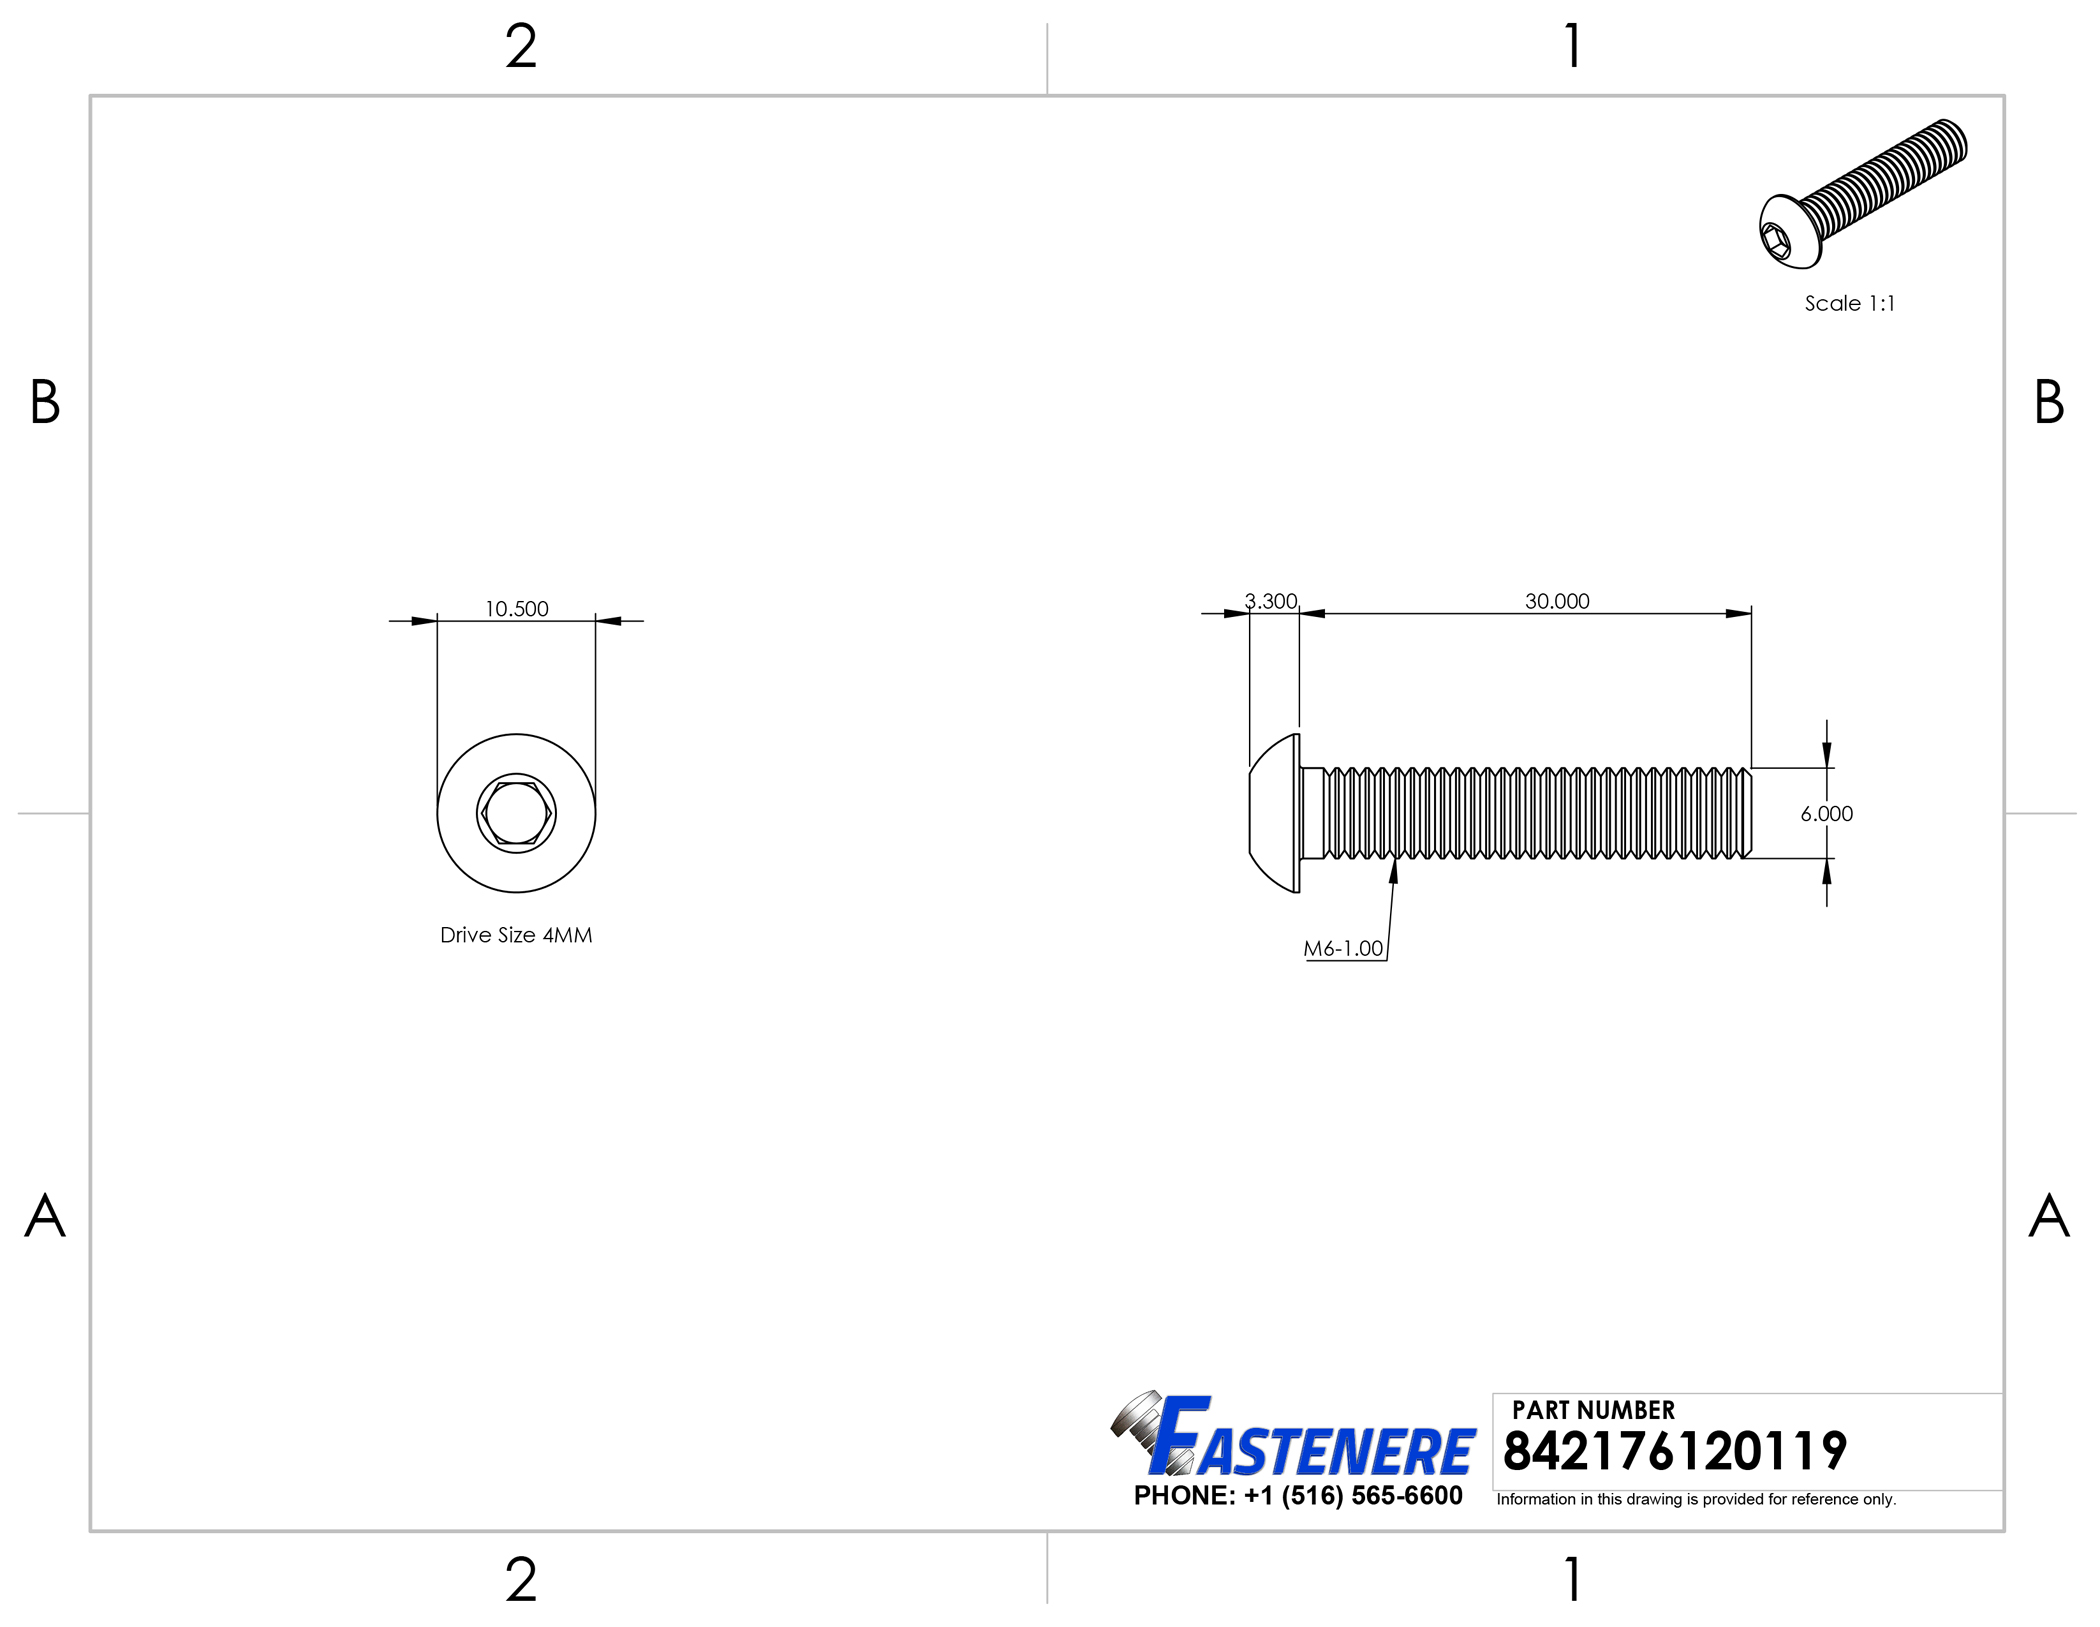 ISO 7380 Allen Socket Drive Full Thread M3-0.50 x 8MM Button Head Socket Cap Screws Flat Point Stainless Steel 18-8 Plain Finish Quantity 100 by Fastenere